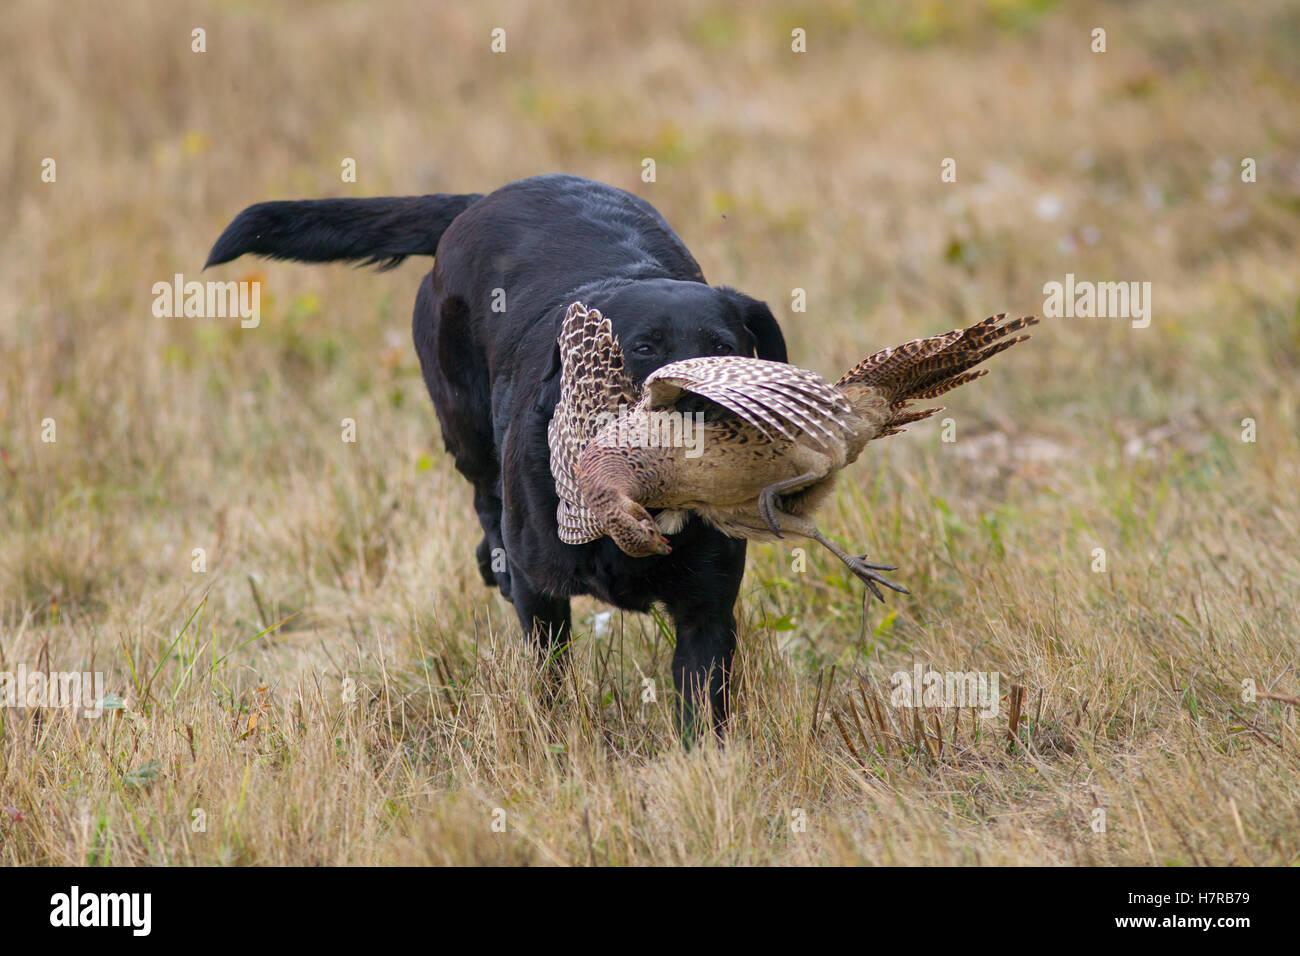 Black Labrador Retrieving Hen Pheasant On Game Shoot Mid